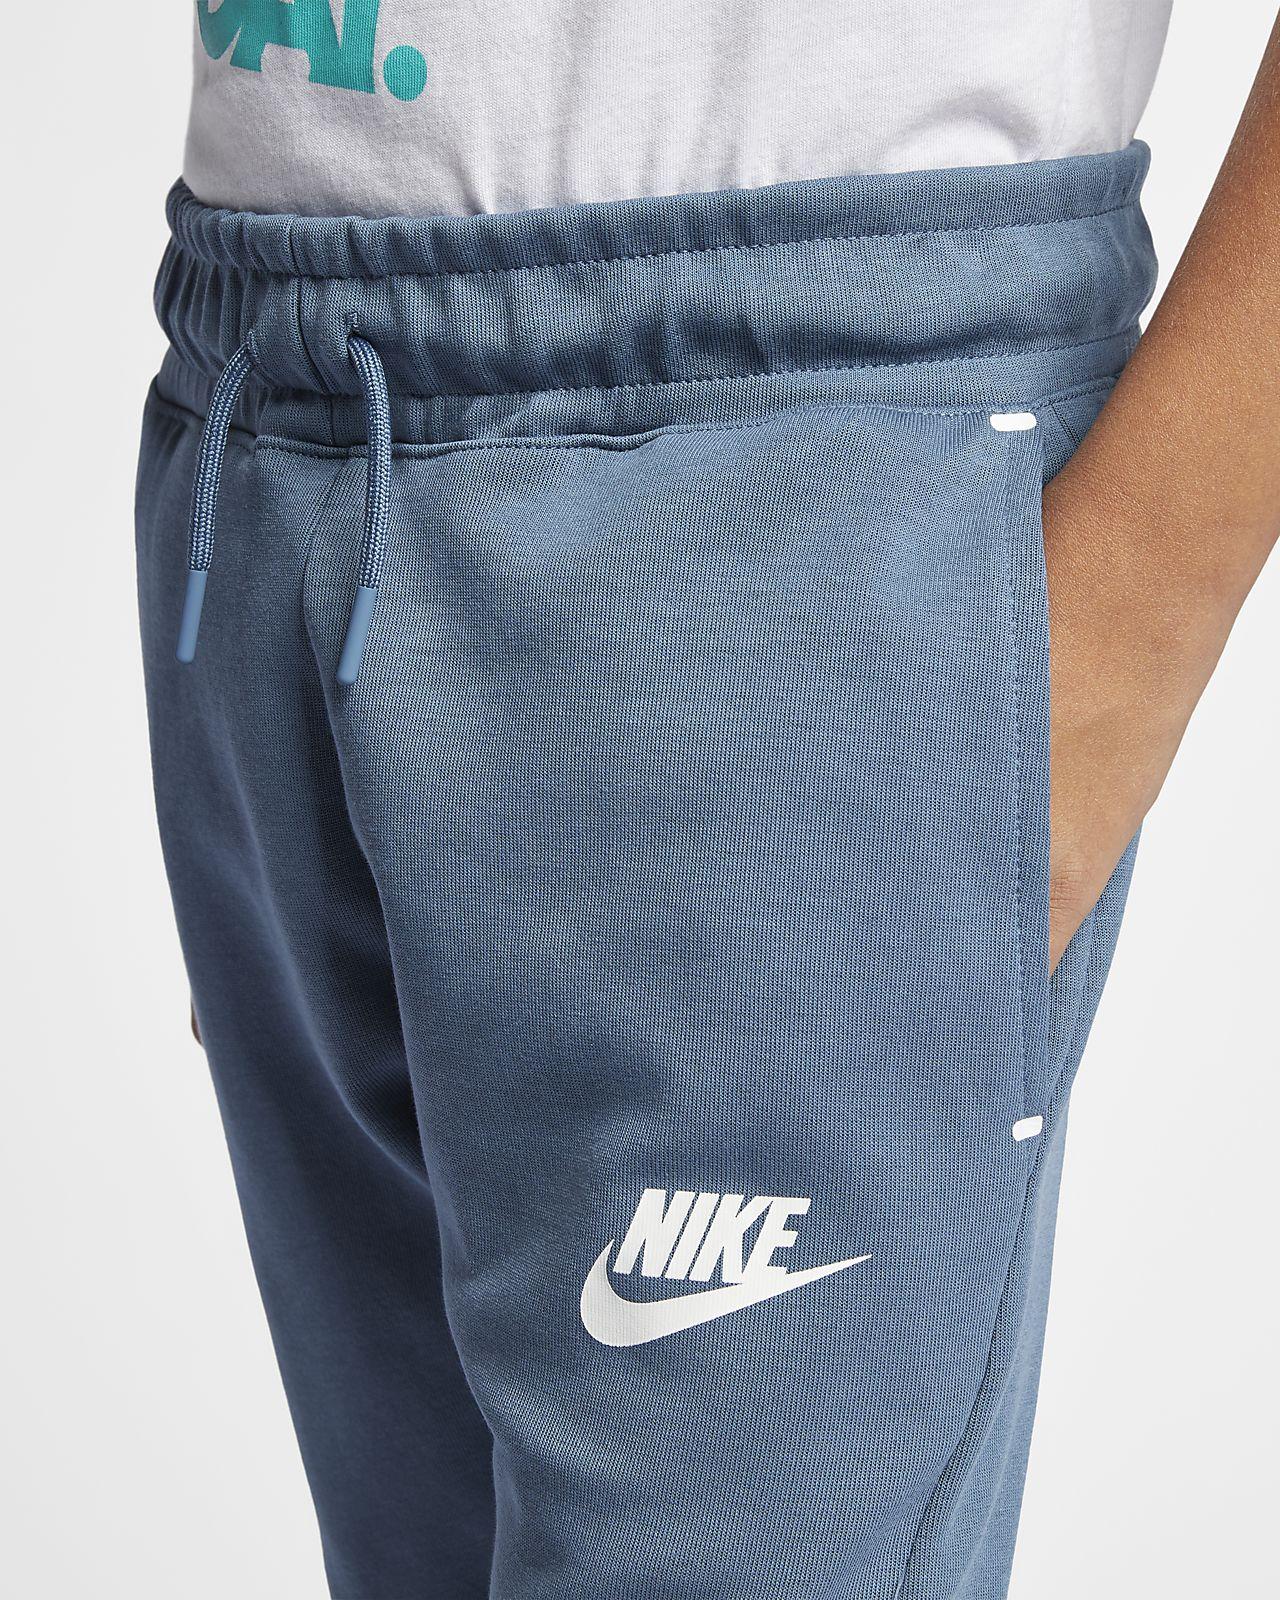 ad65d5a7 Nike Sportswear Big Kids' Tech Fleece Pants. Nike.com